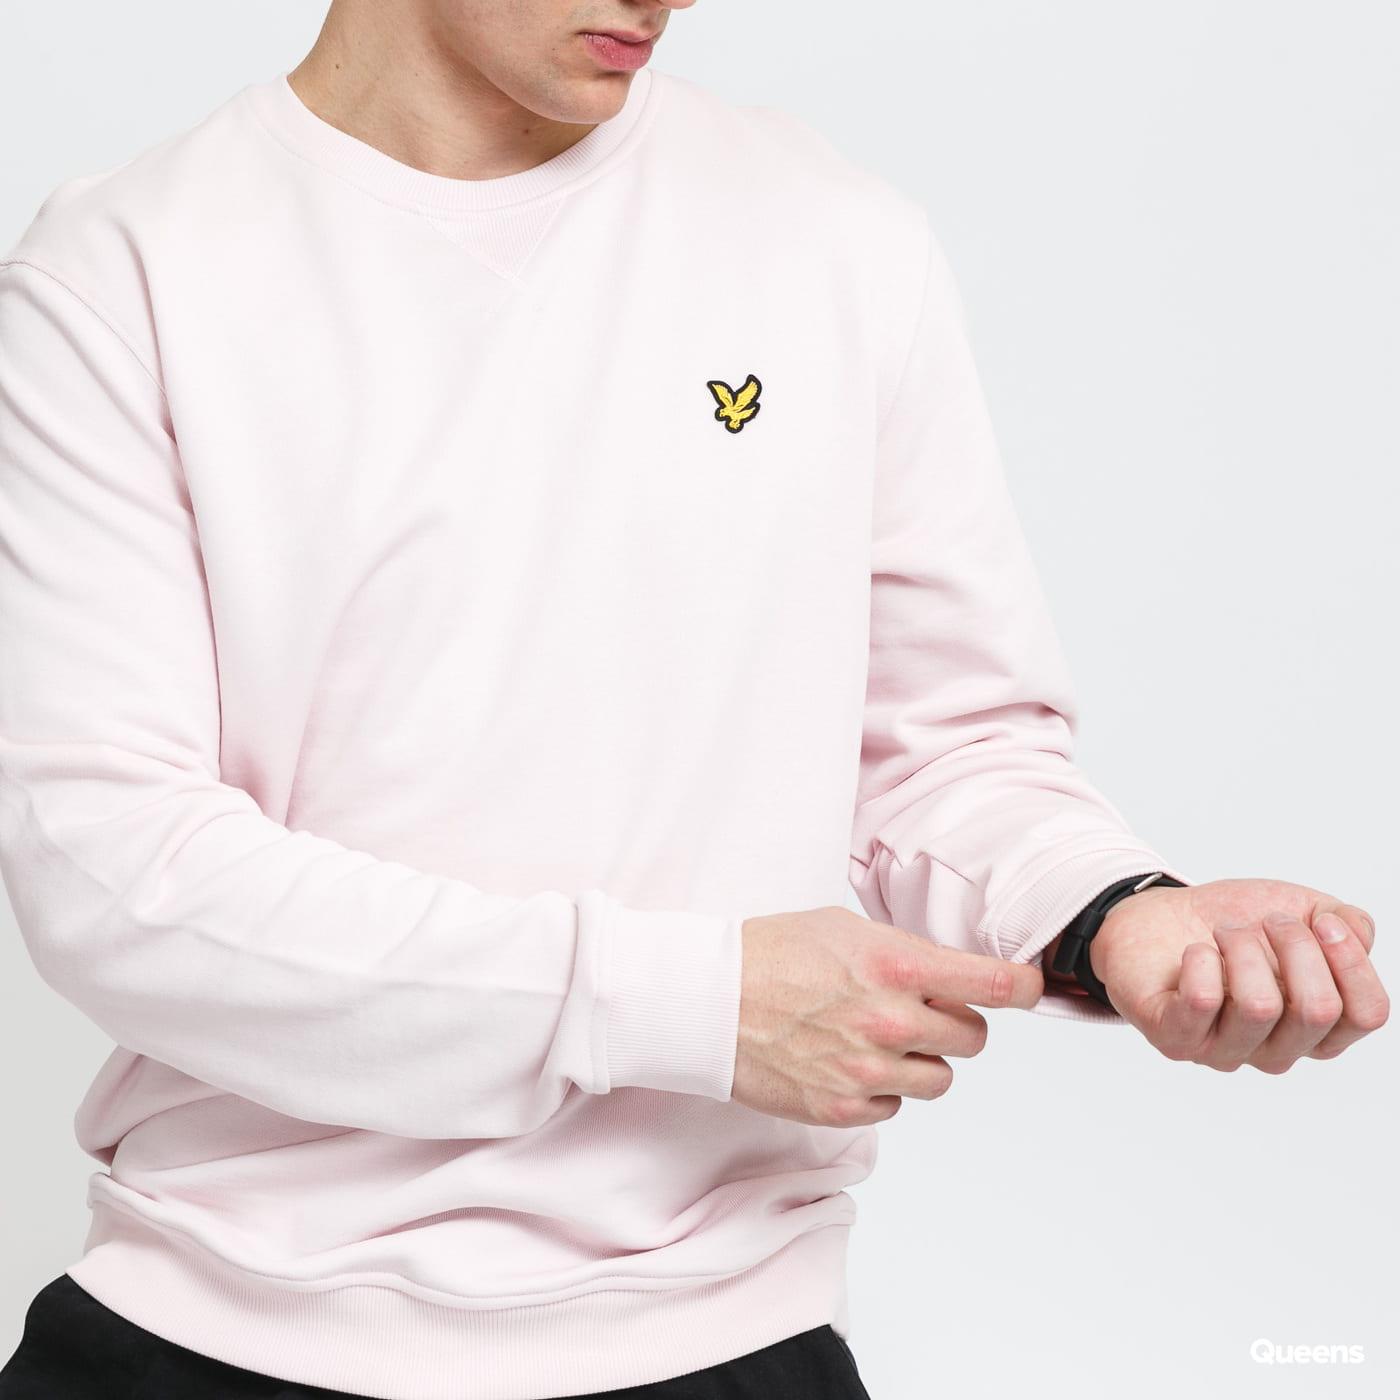 Lyle & Scott Crew Neck Sweatshirt light pink